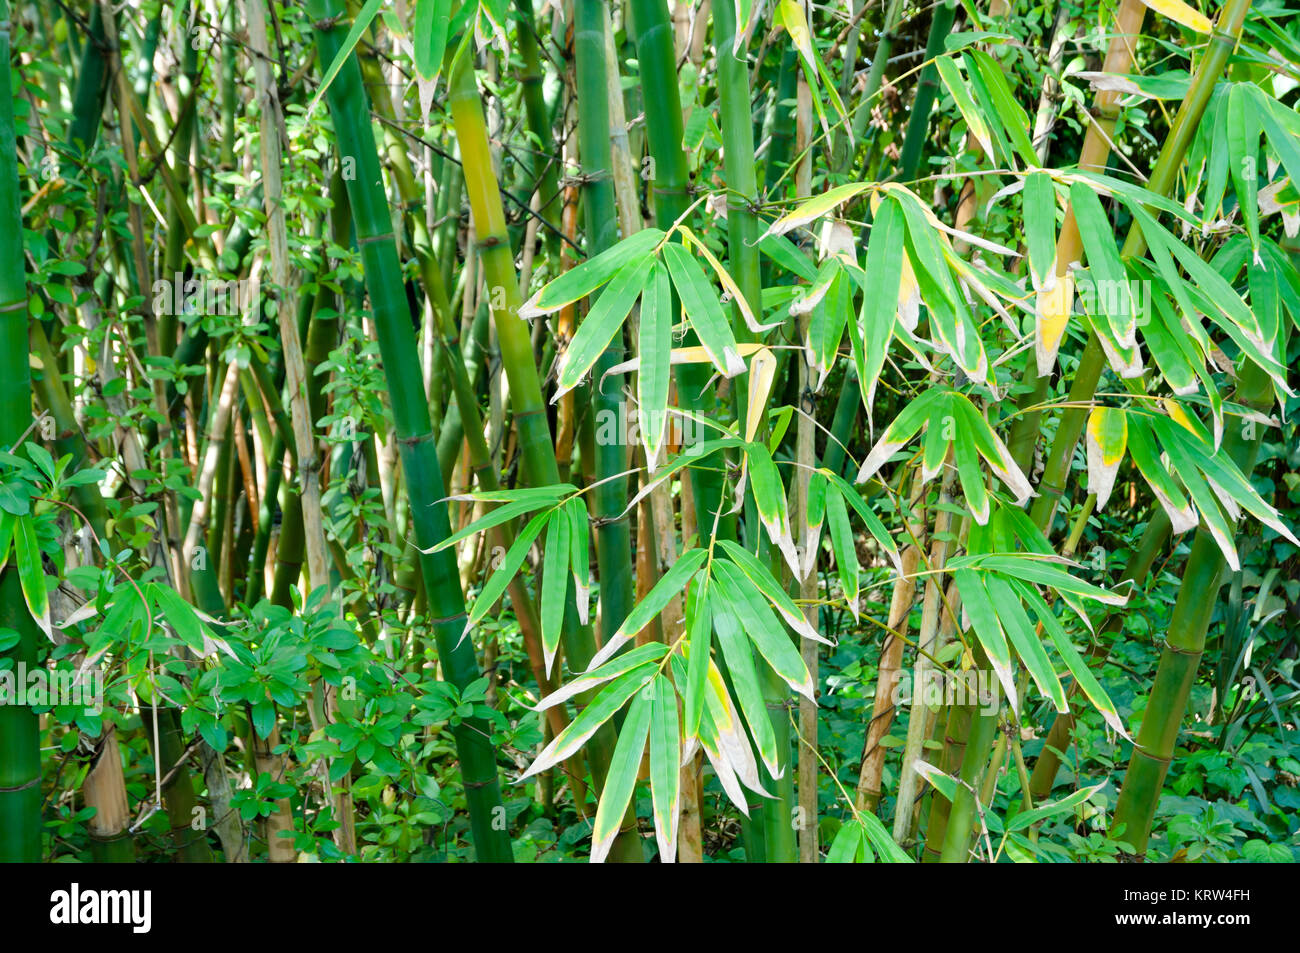 Palos De Bambu Bosque Foto Imagen De Stock 169582773 Alamy - Palos-de-bambu